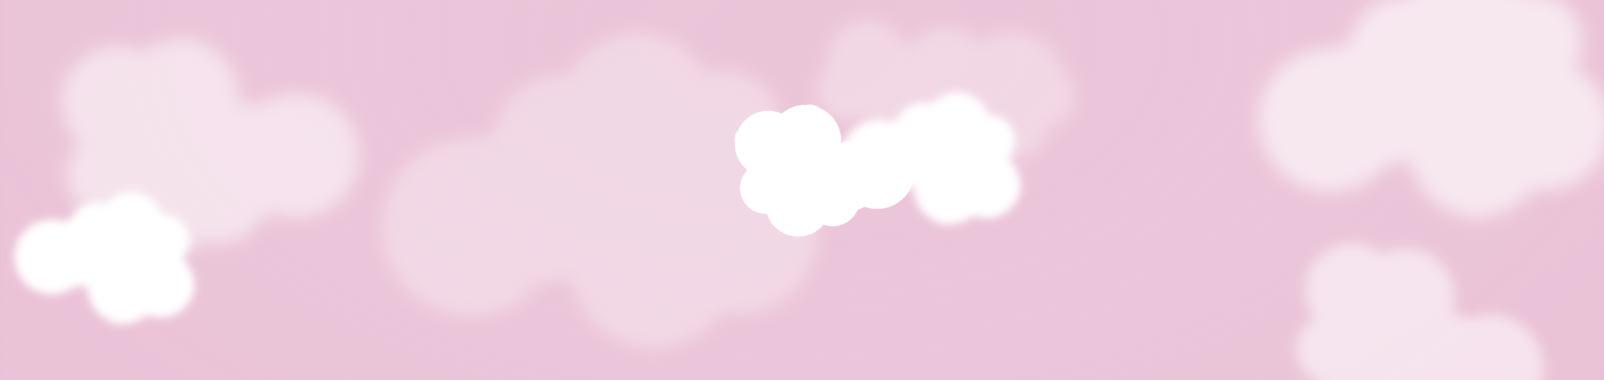 banner_3_fondo